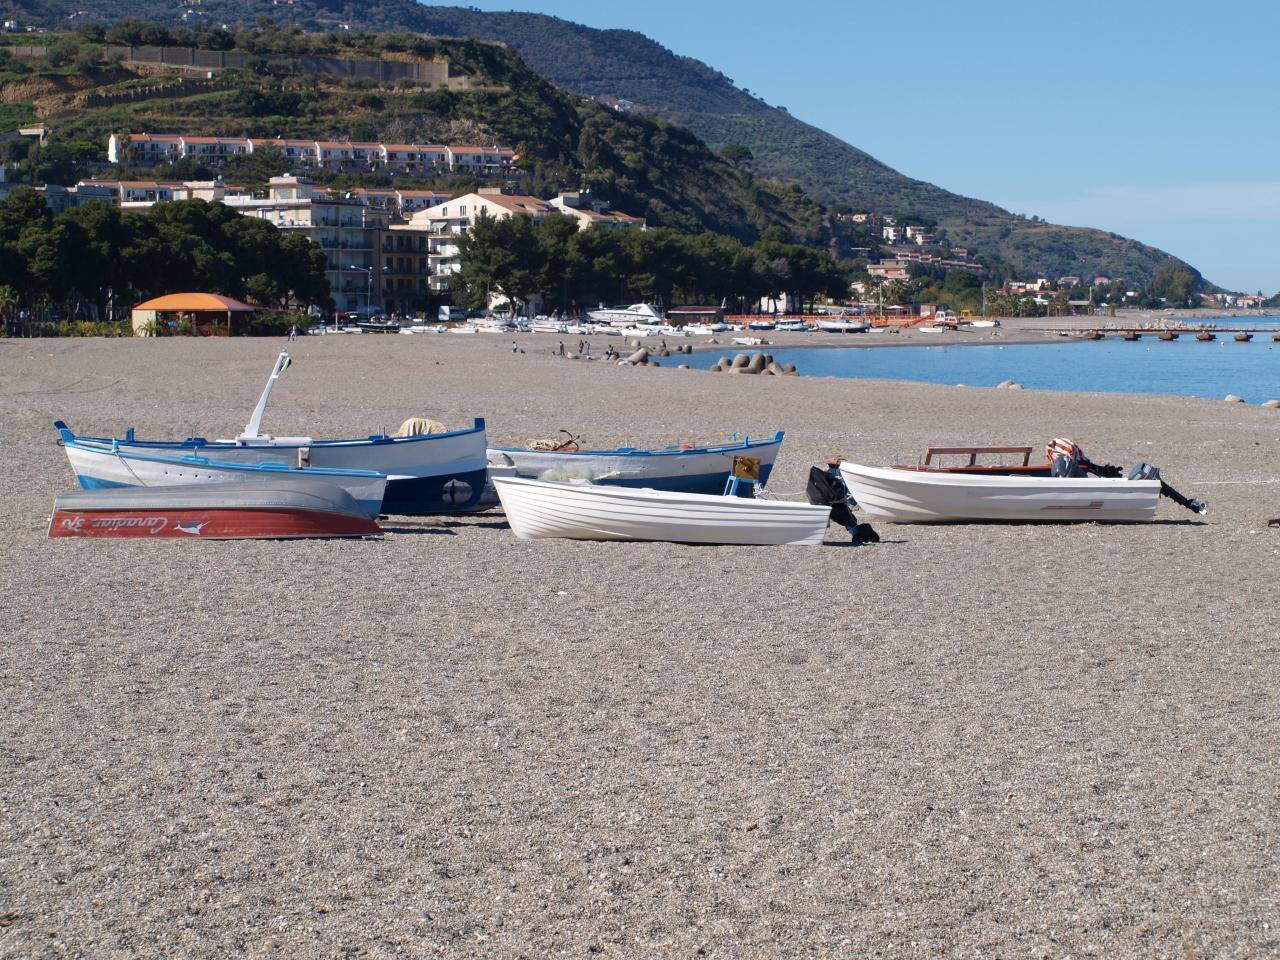 Ferienwohnung VILLA  HELIOS (361515), Gioiosa Marea, Messina, Sizilien, Italien, Bild 15